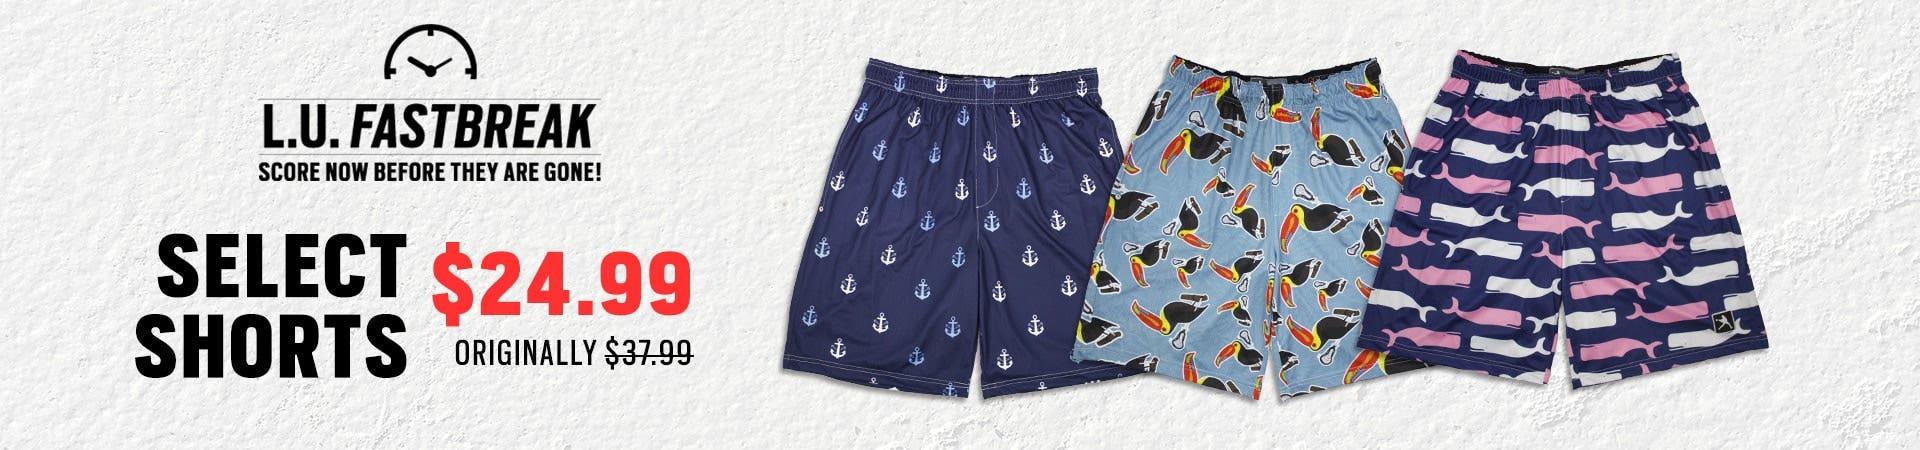 FASTBREAK: $24.99 Select Shorts